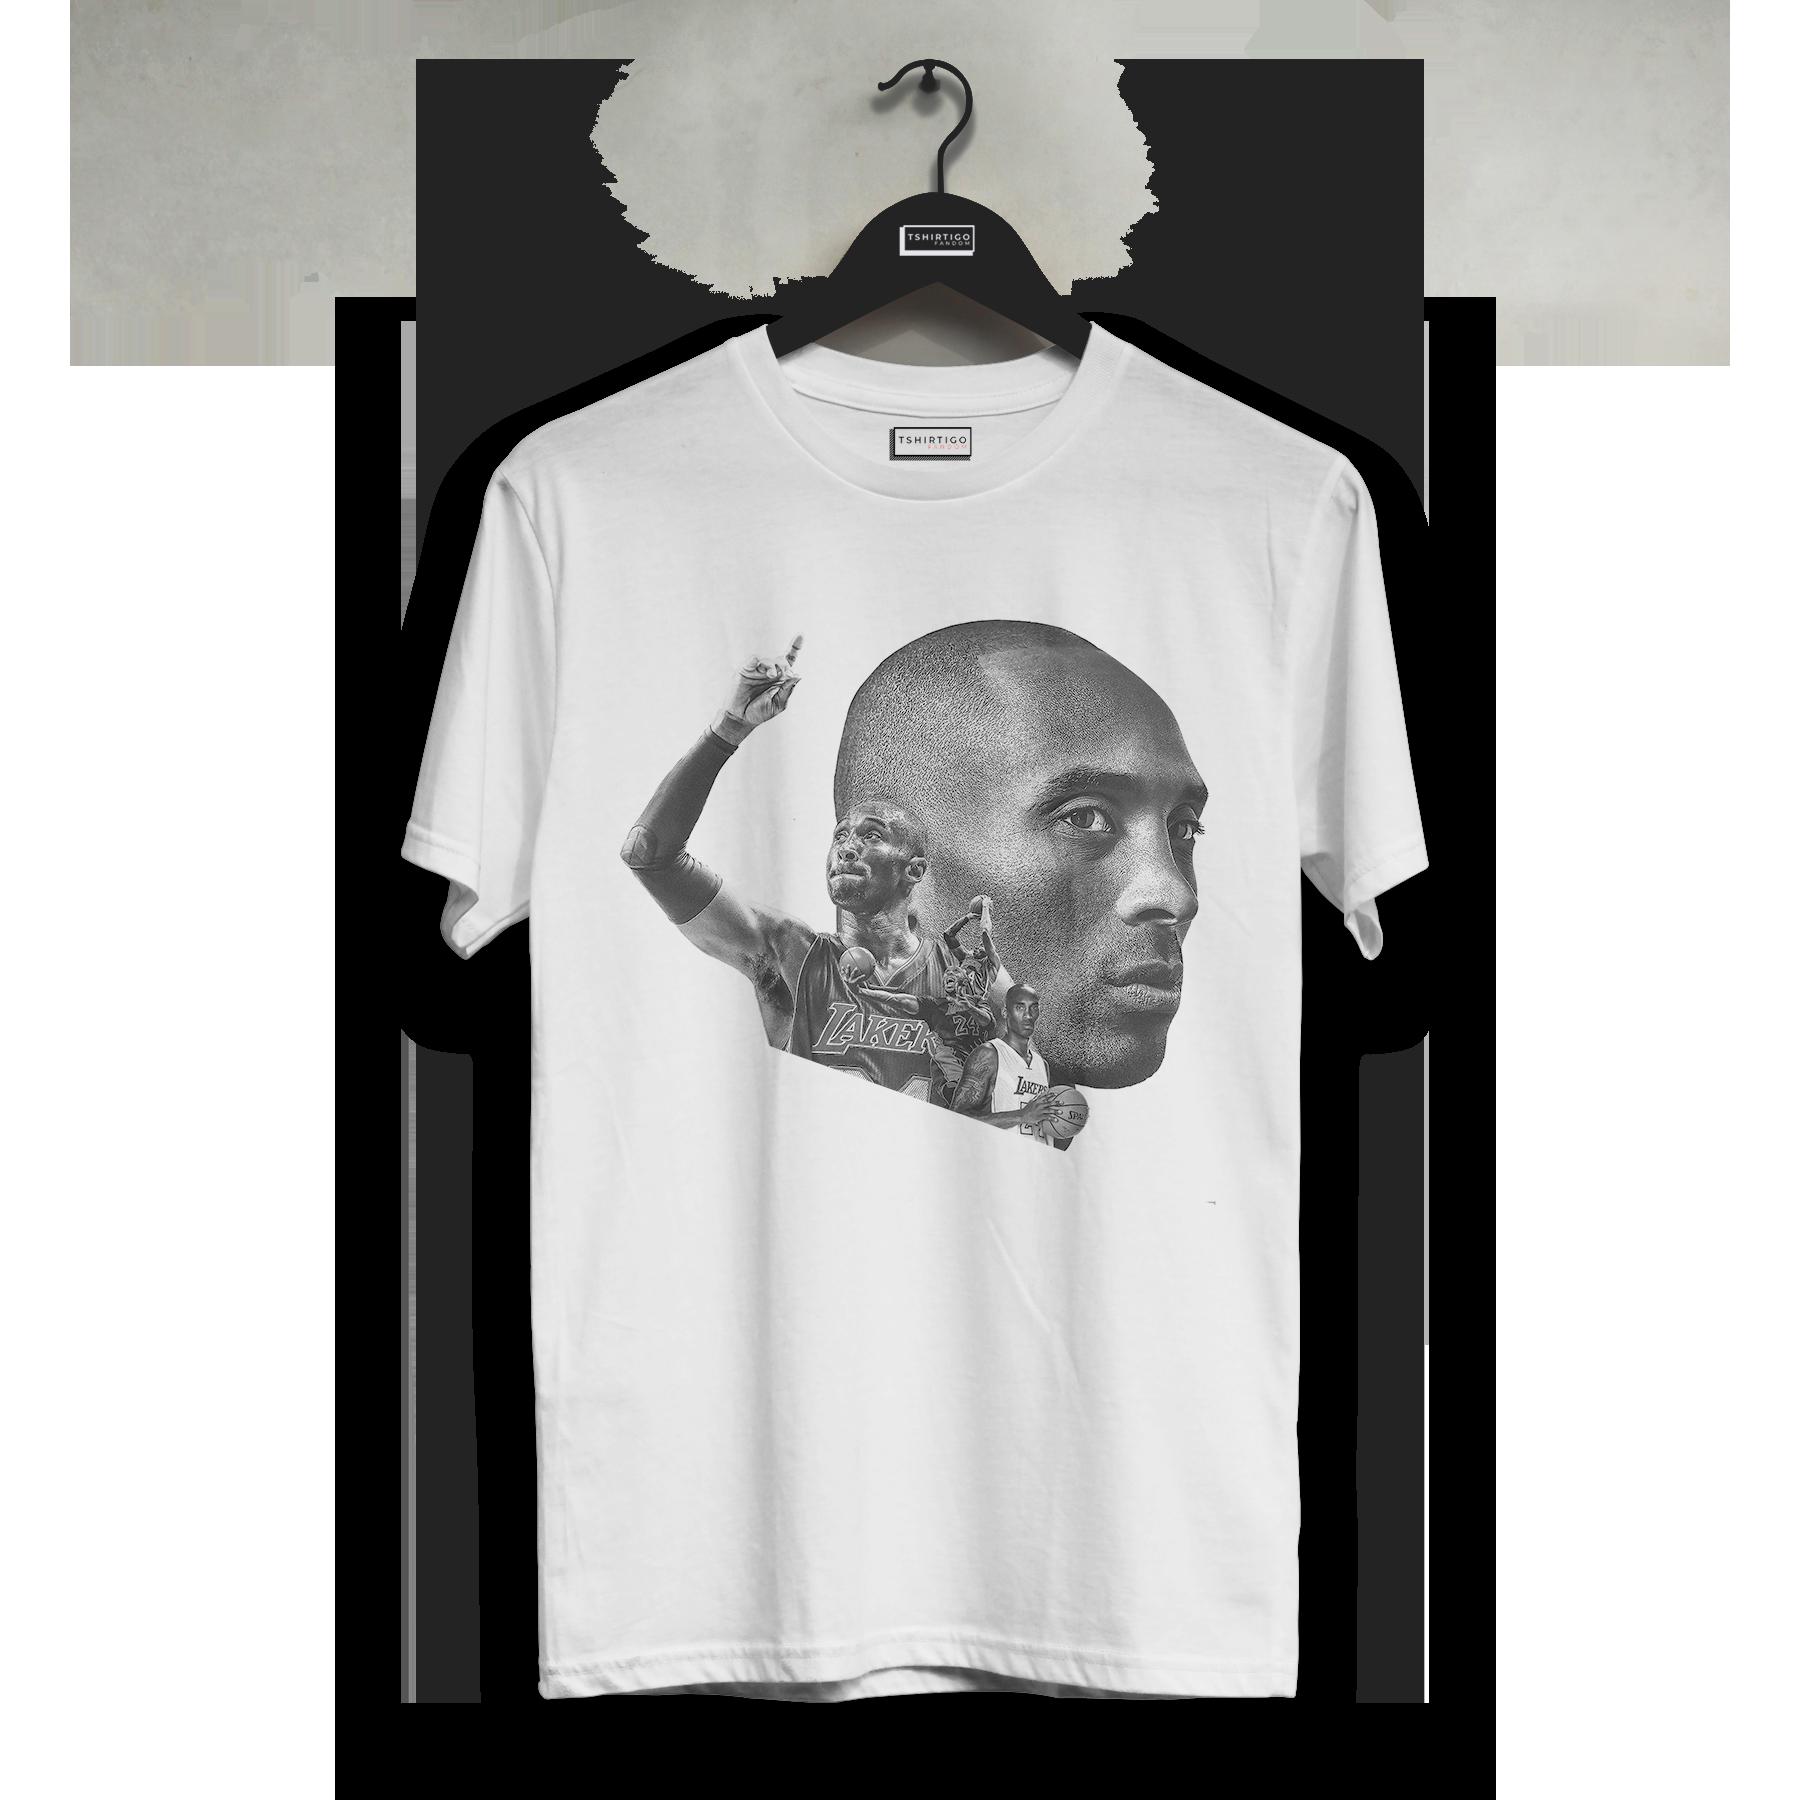 2020 Kobe Bryant negro Mamba leyenda camiseta Lakers Kobe impreso camiseta baloncesto NBA regalo deporte blanco camiseta